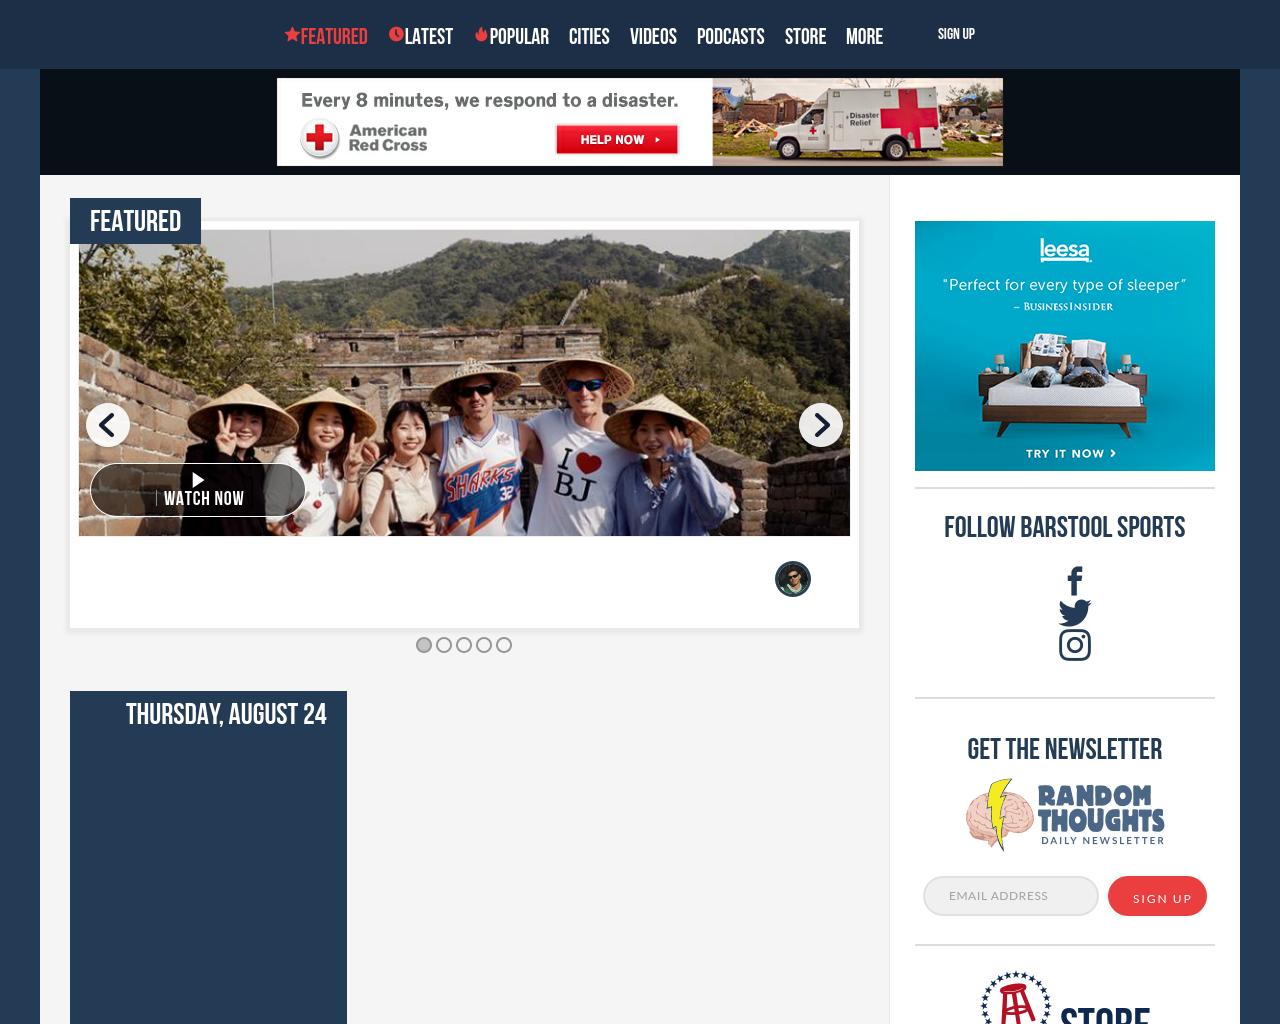 Barstool-Sports-Advertising-Reviews-Pricing